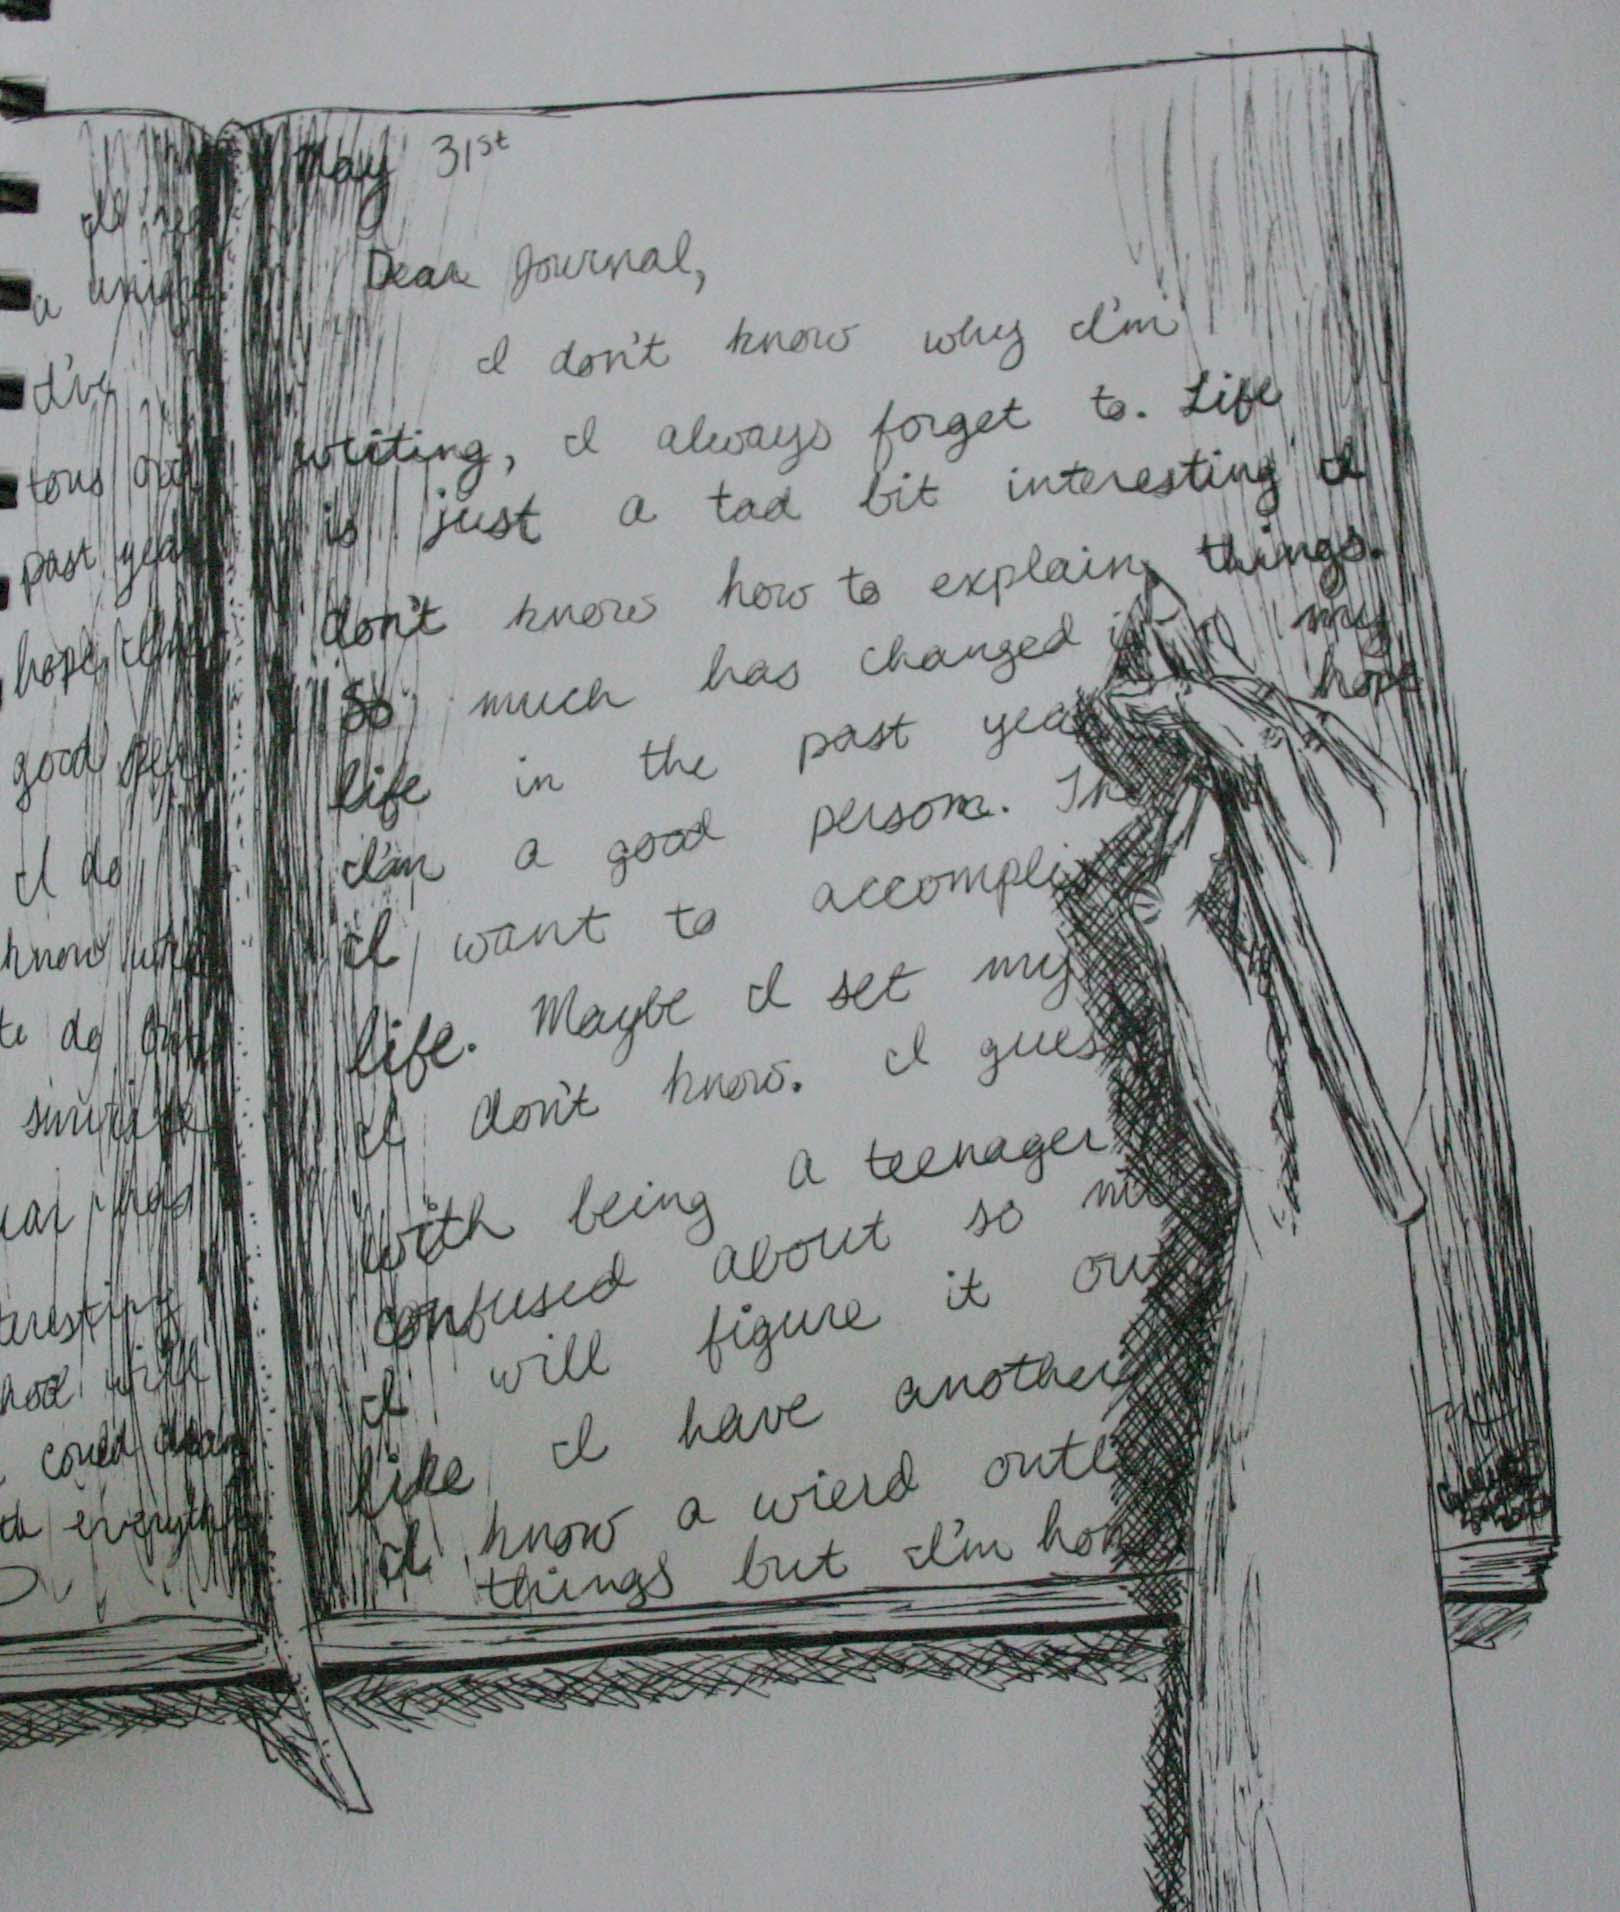 how to delete journal entry on deviantart